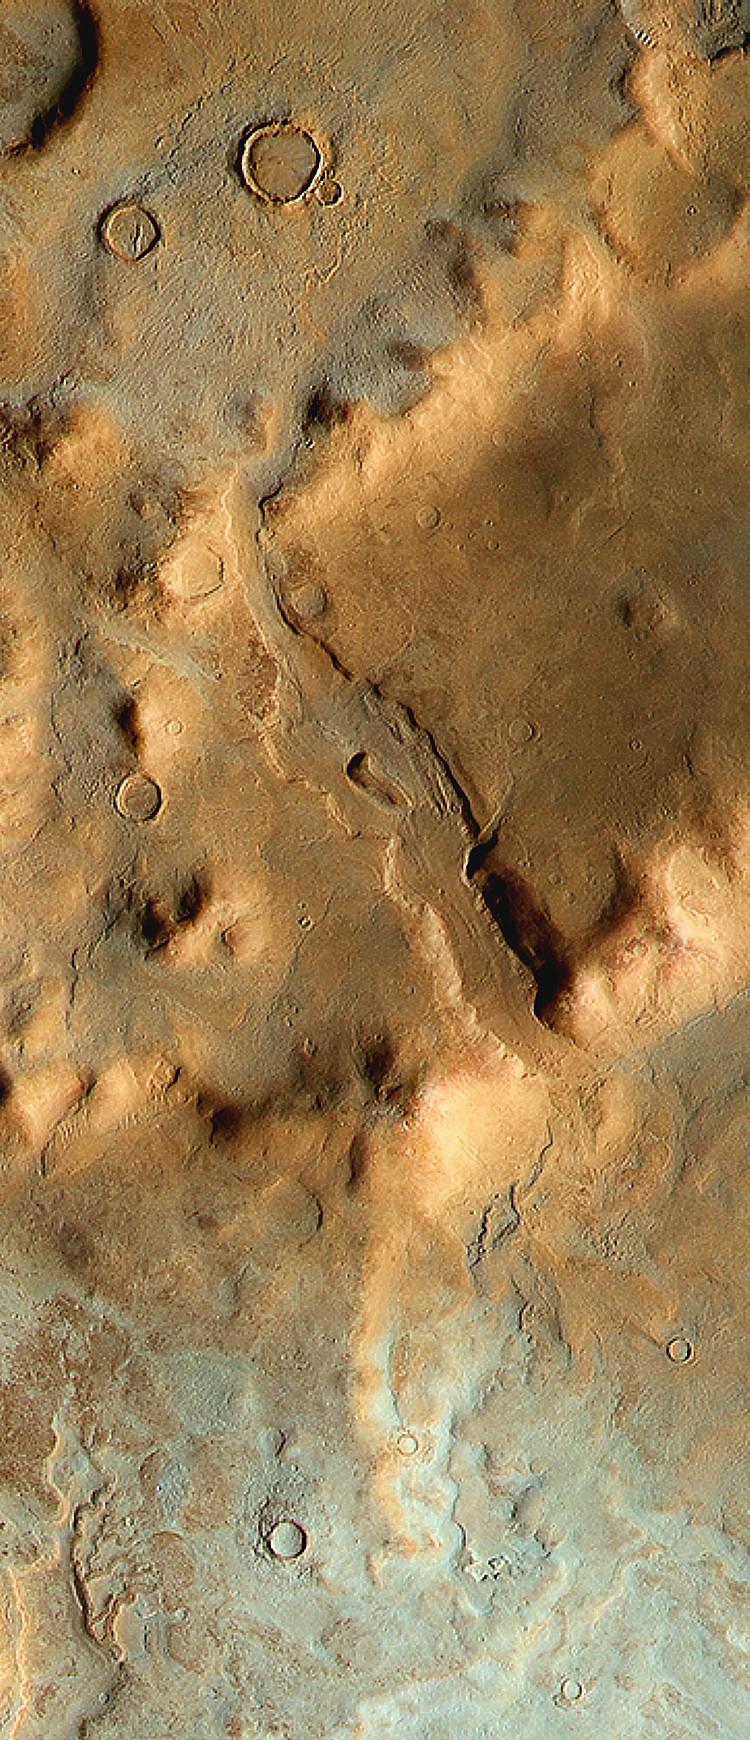 Hellas_Basin_rim détaila